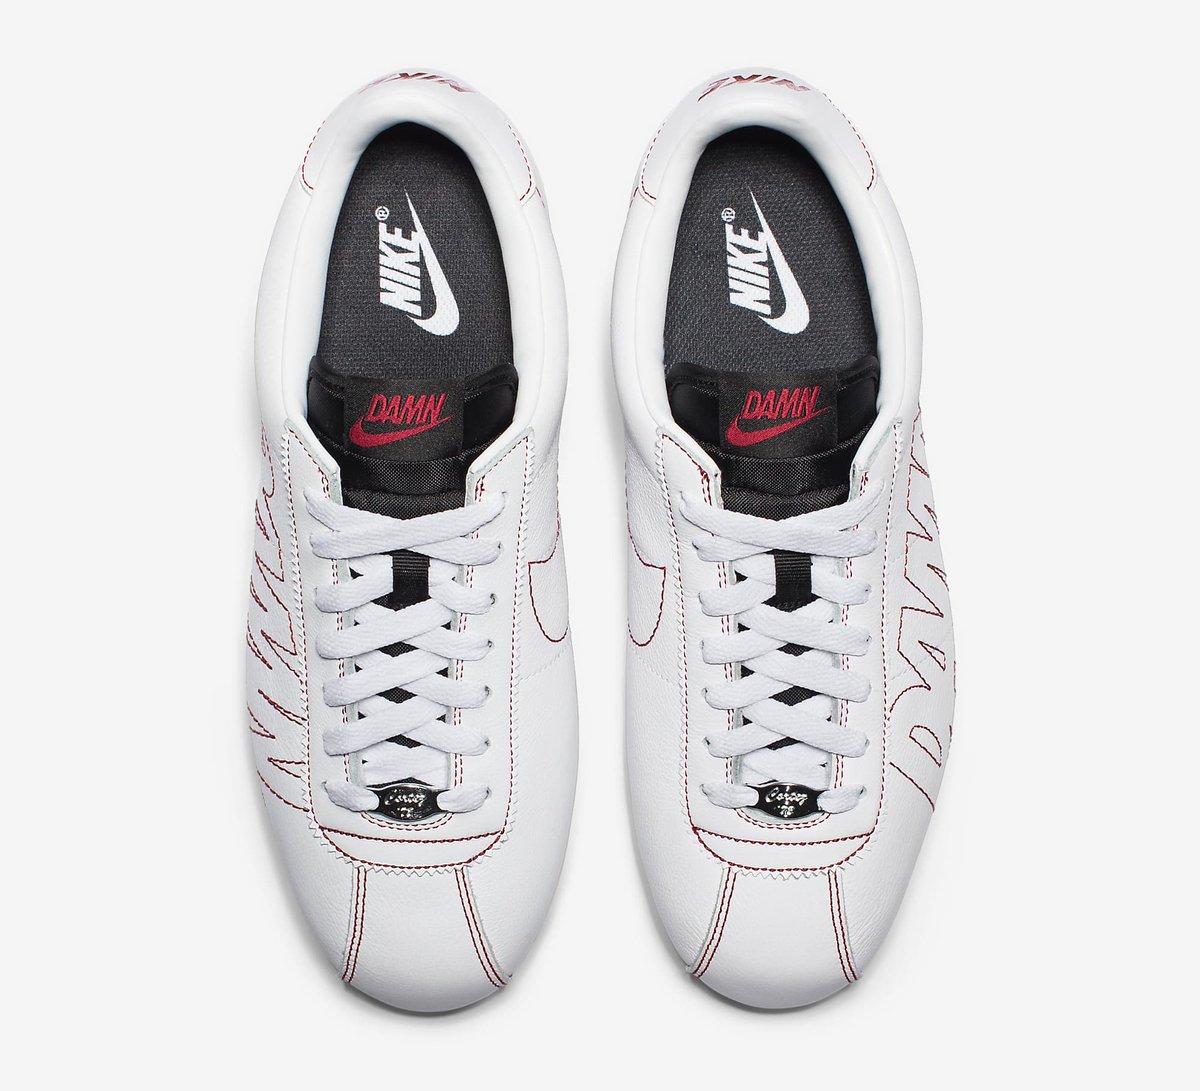 3f2c0dd2c44 Complex Sneakers on Twitter